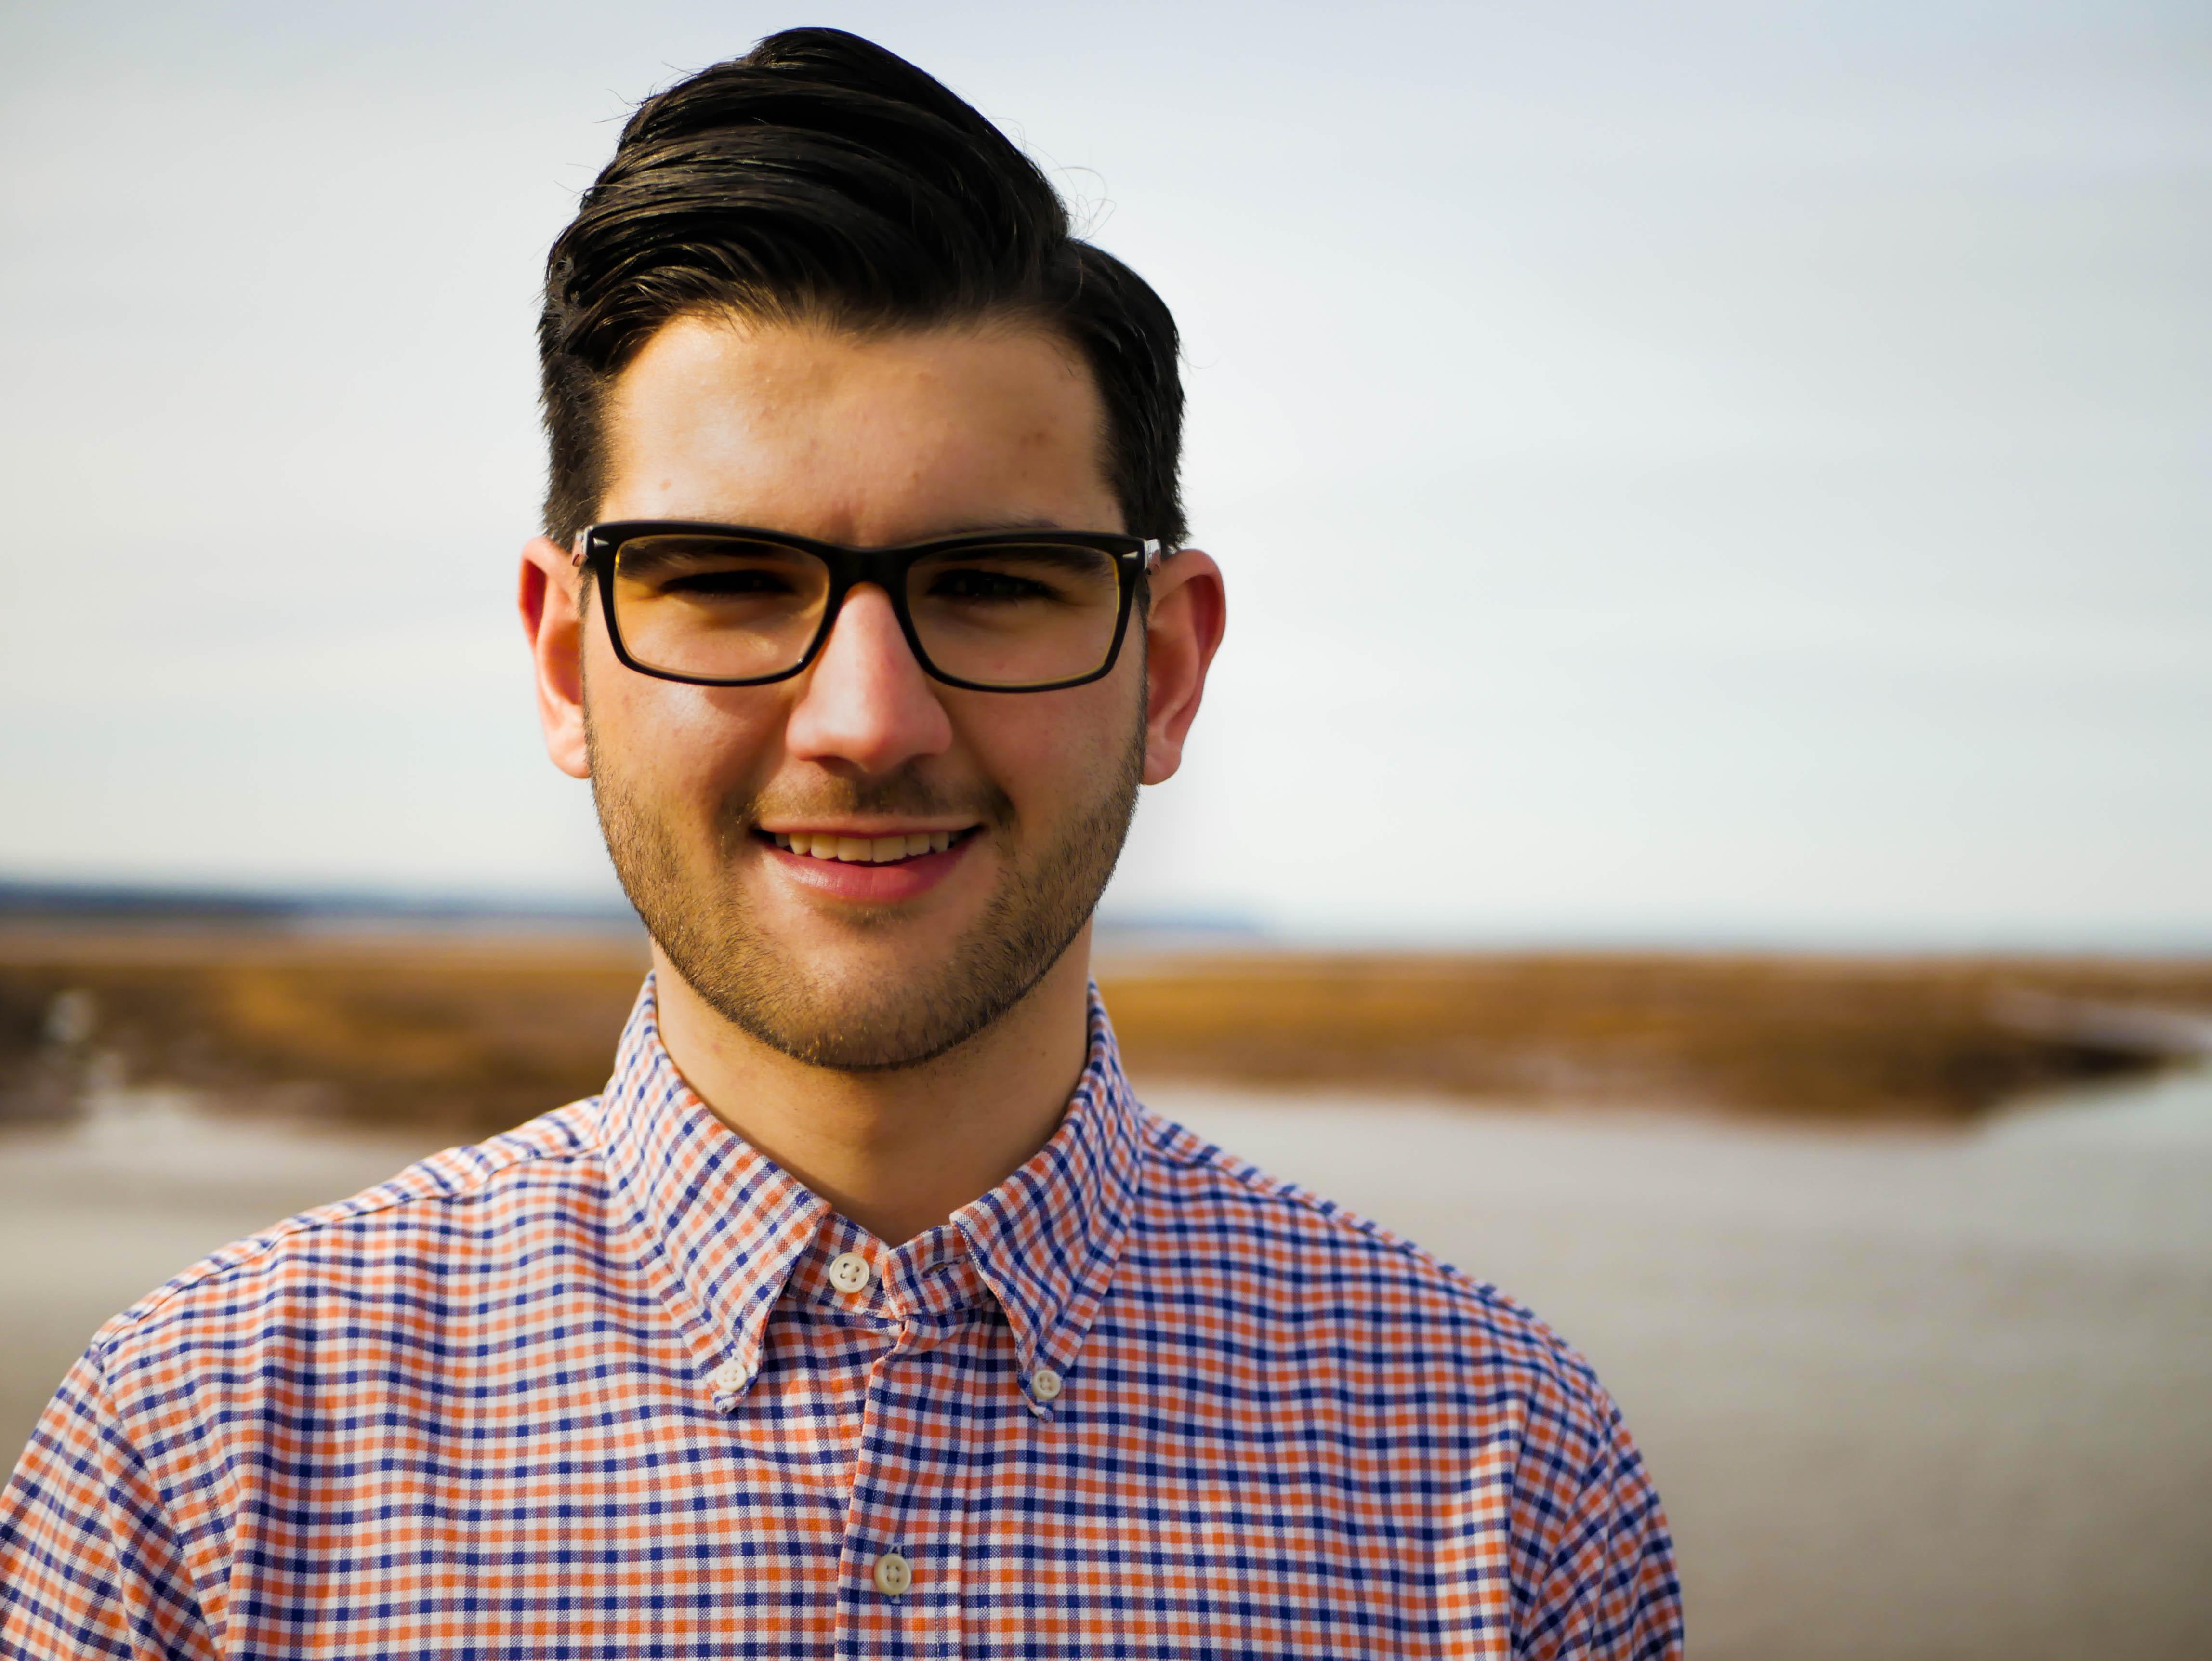 Brett Murray of Creative Tide headshot in Wolfville, Nova Scotia